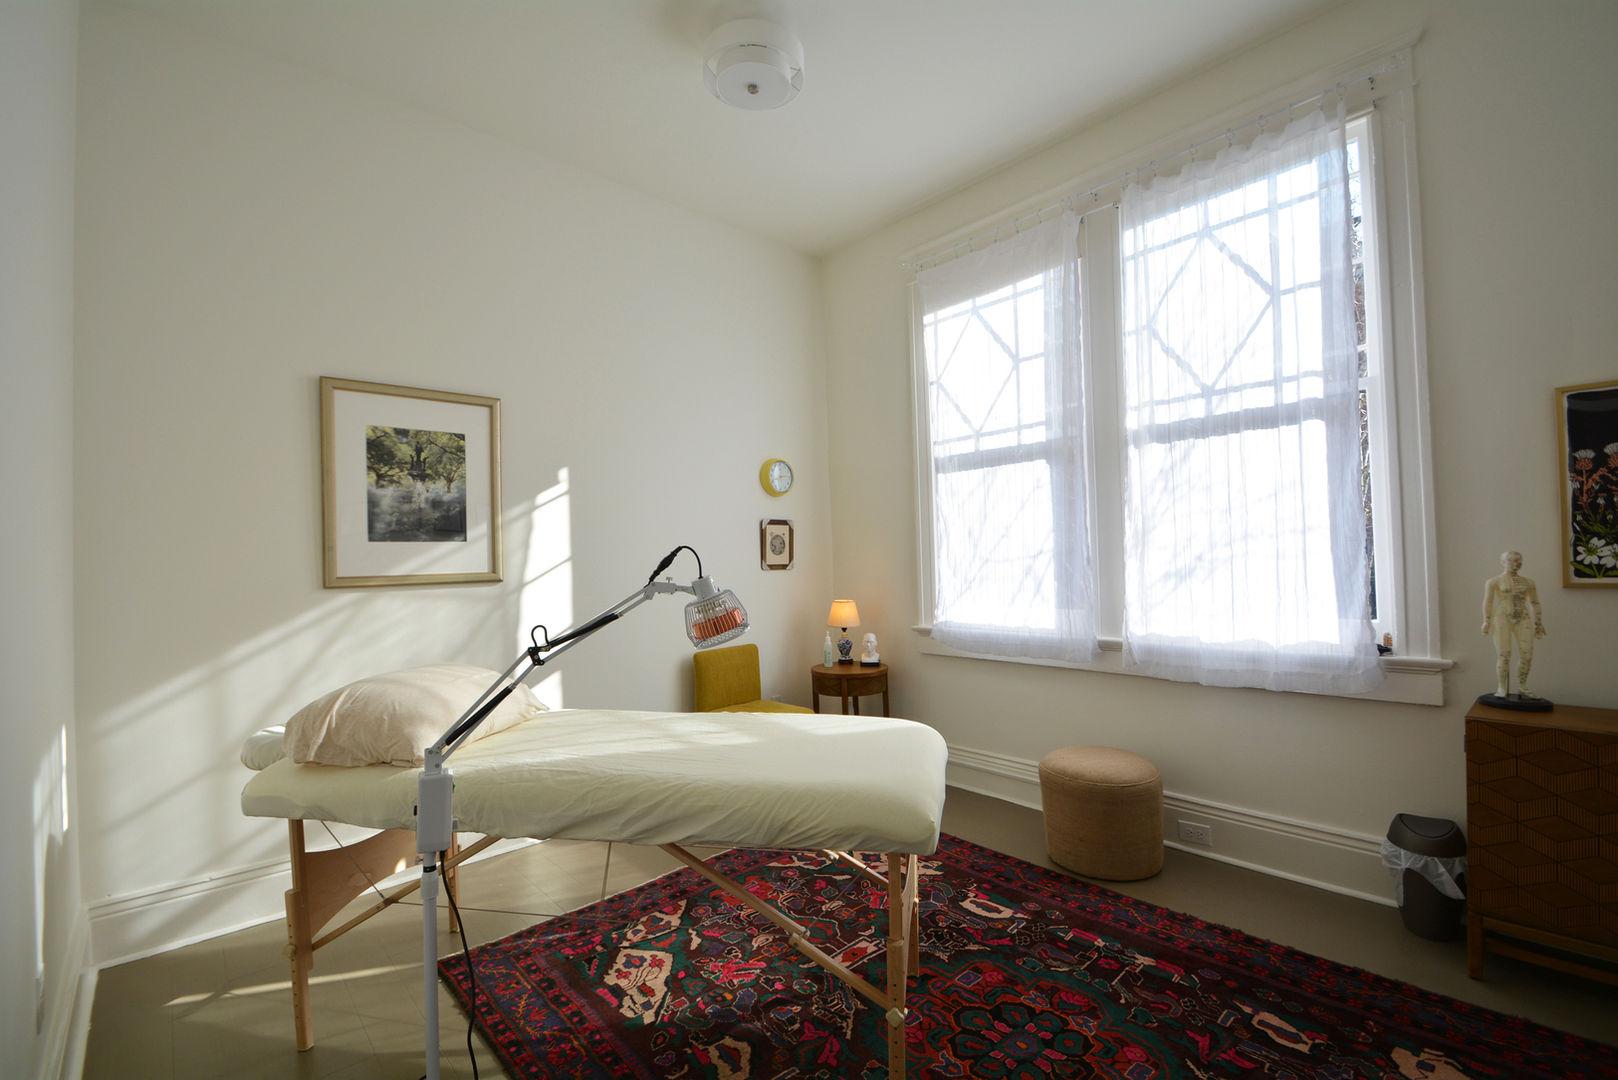 Acupuncture Treatment Room #2